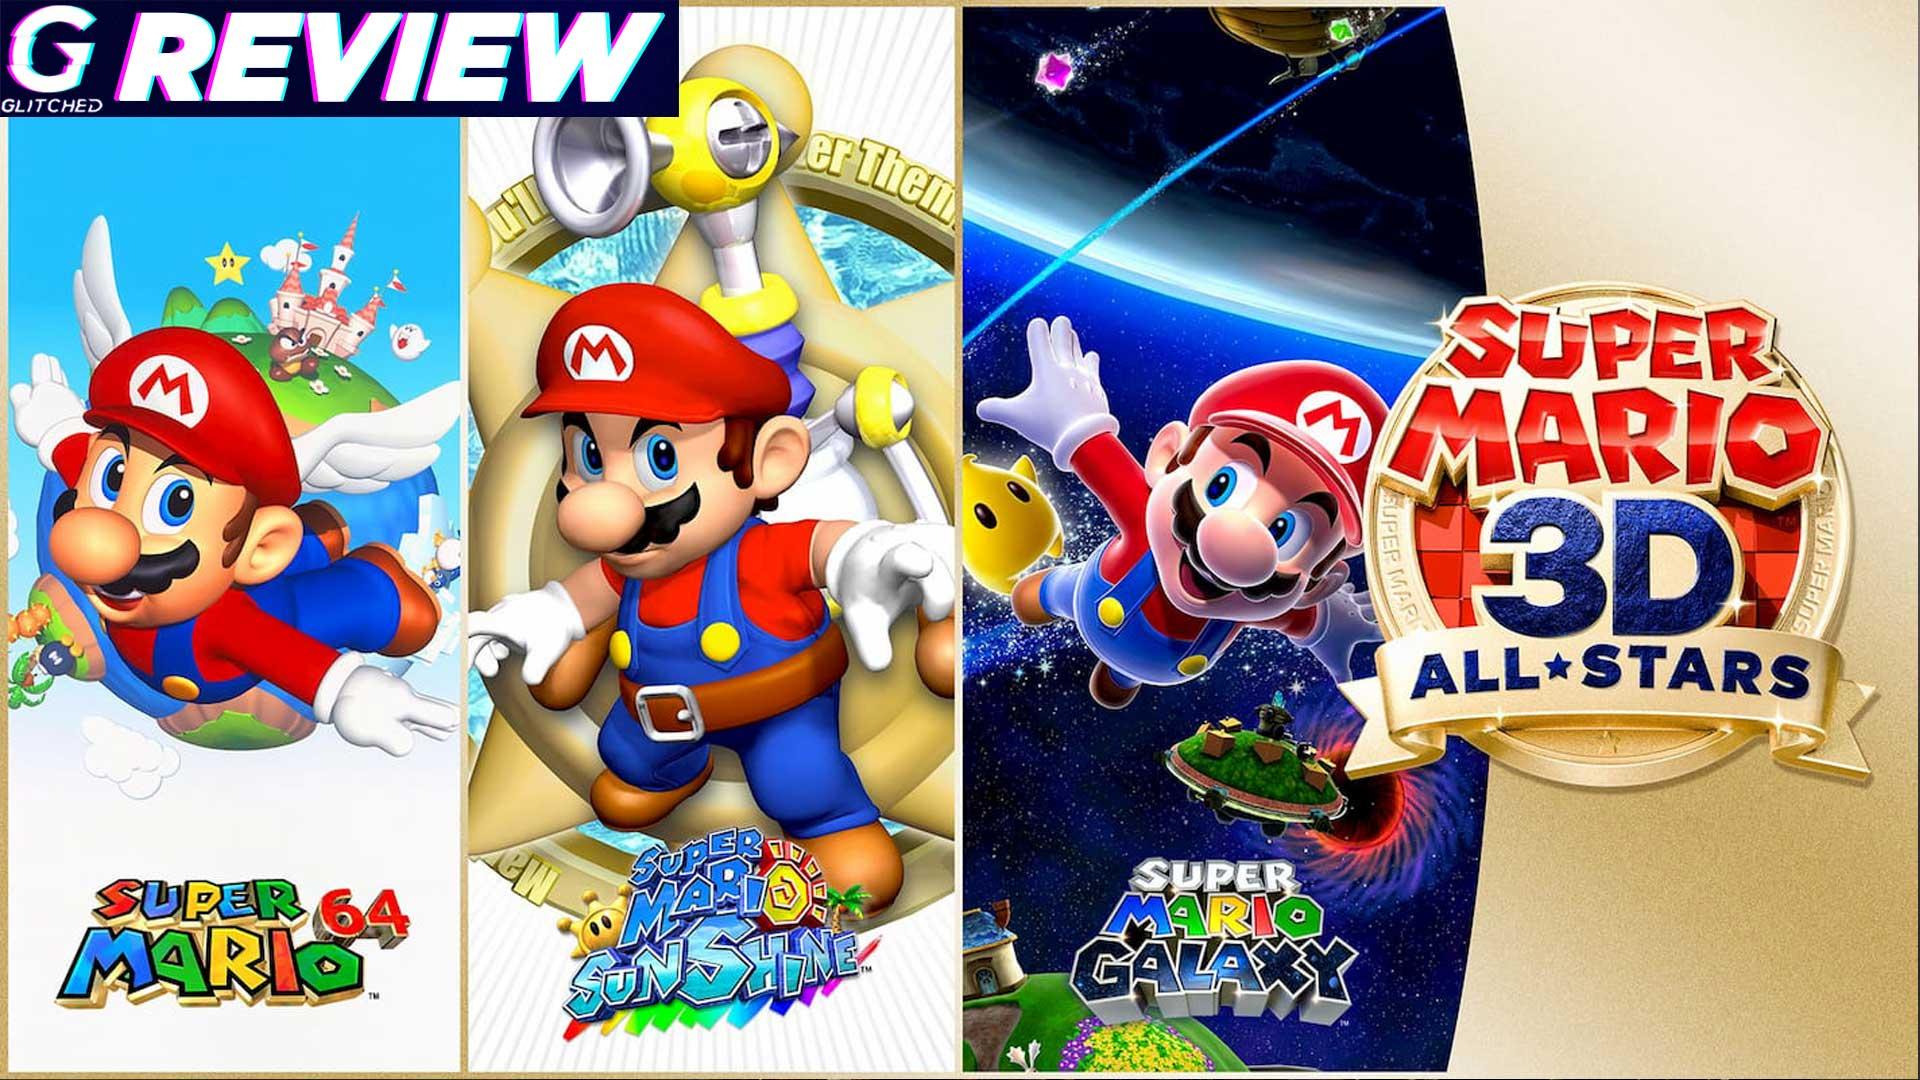 Super Mario 3D All-Stars Review